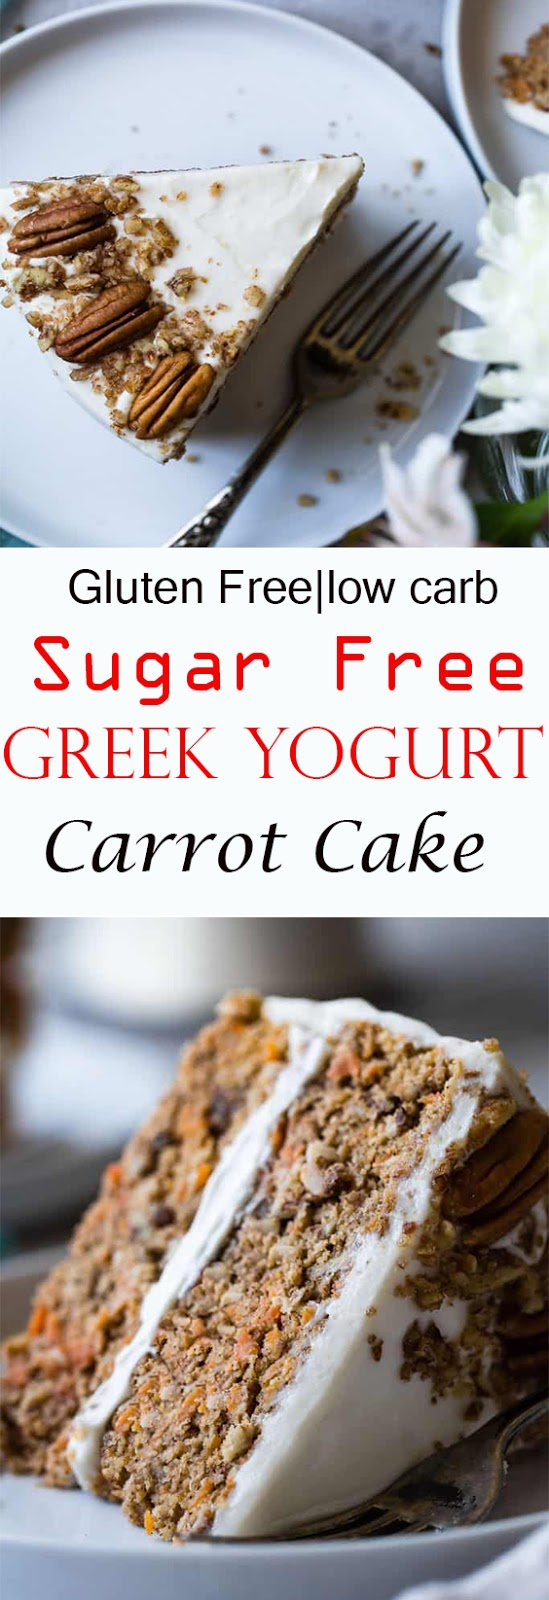 Healthy Gluten Free Sugar Free Carrot Cake